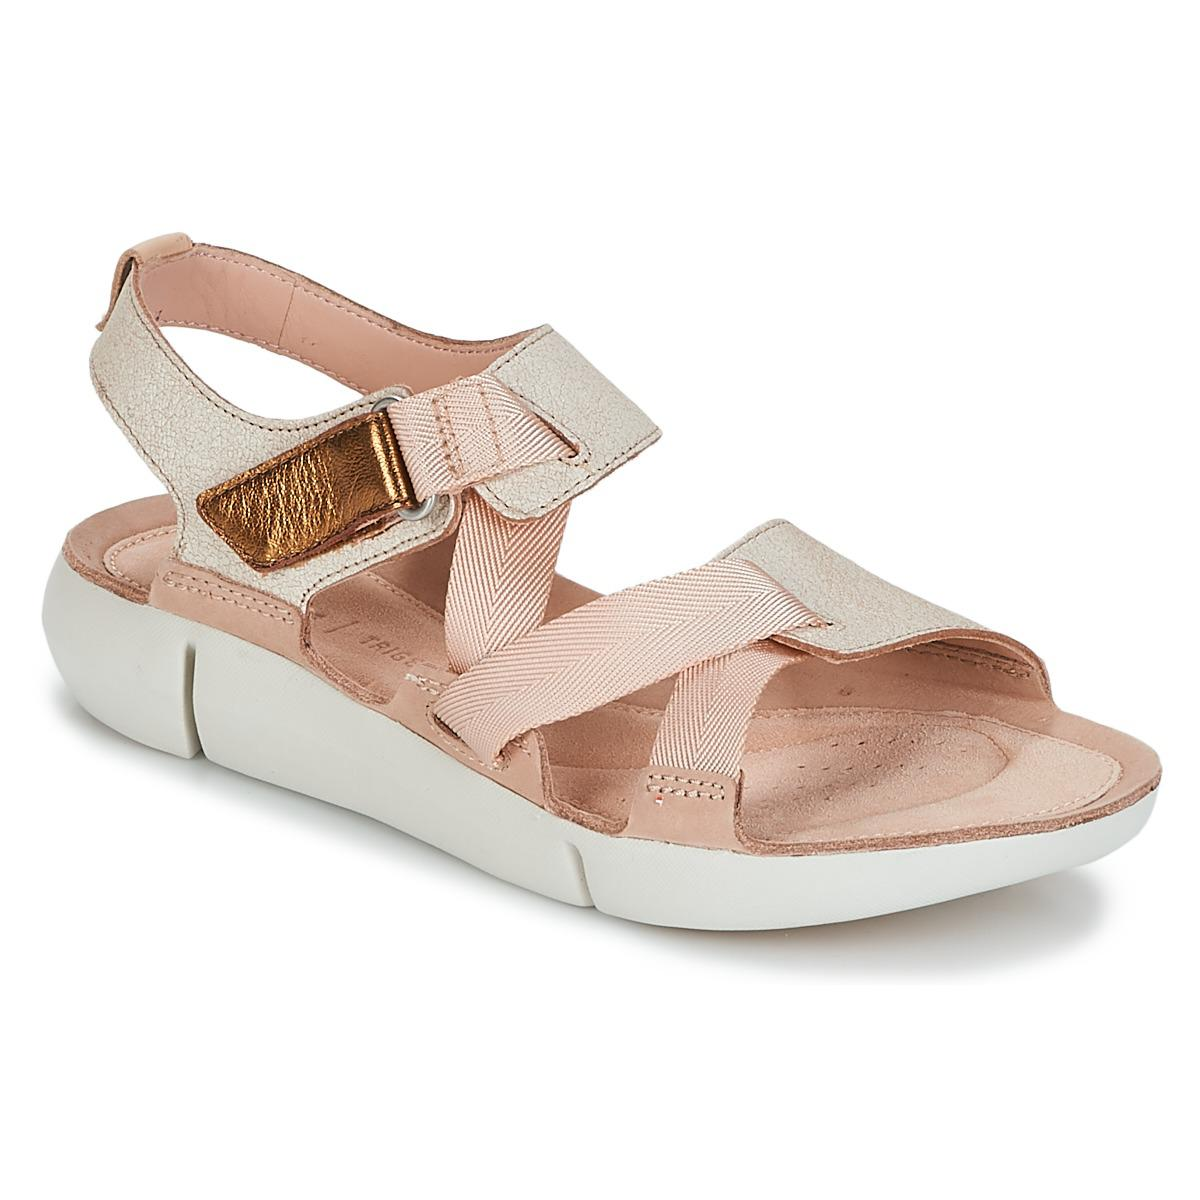 Clarks Tri Clover Women s Sandals In Beige in Natural - Save 31% - Lyst